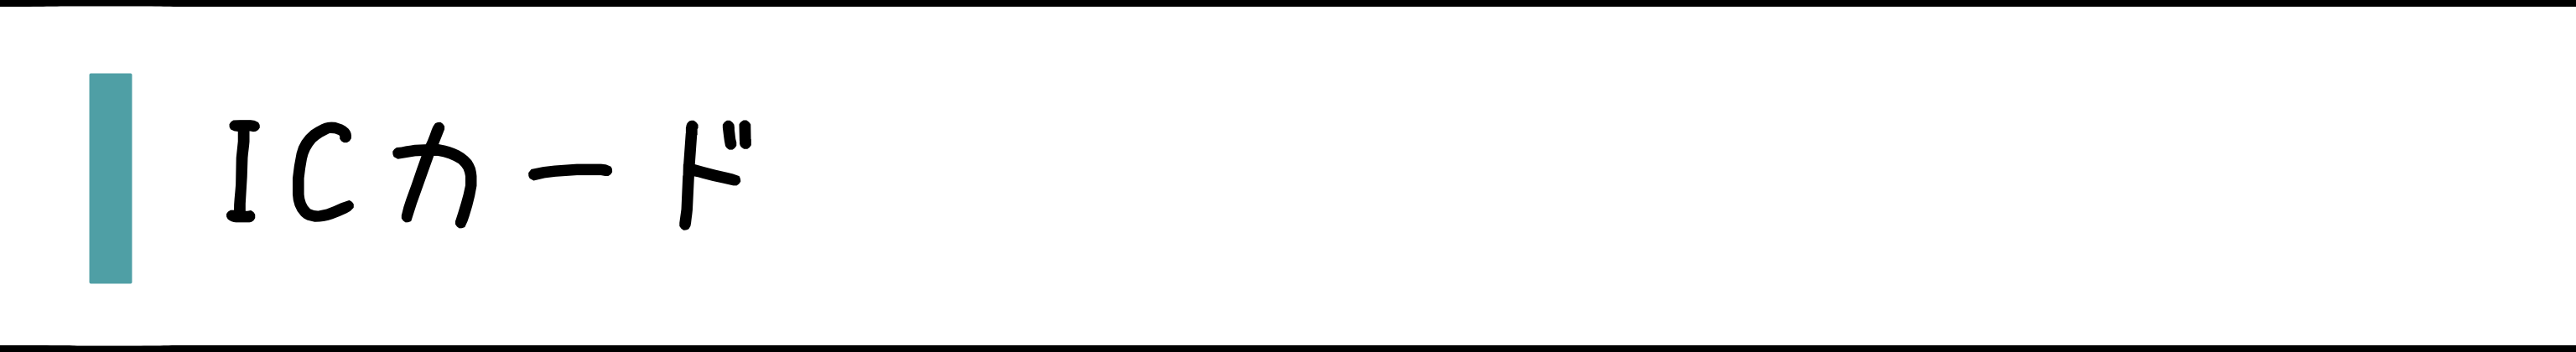 ICカード.PNG